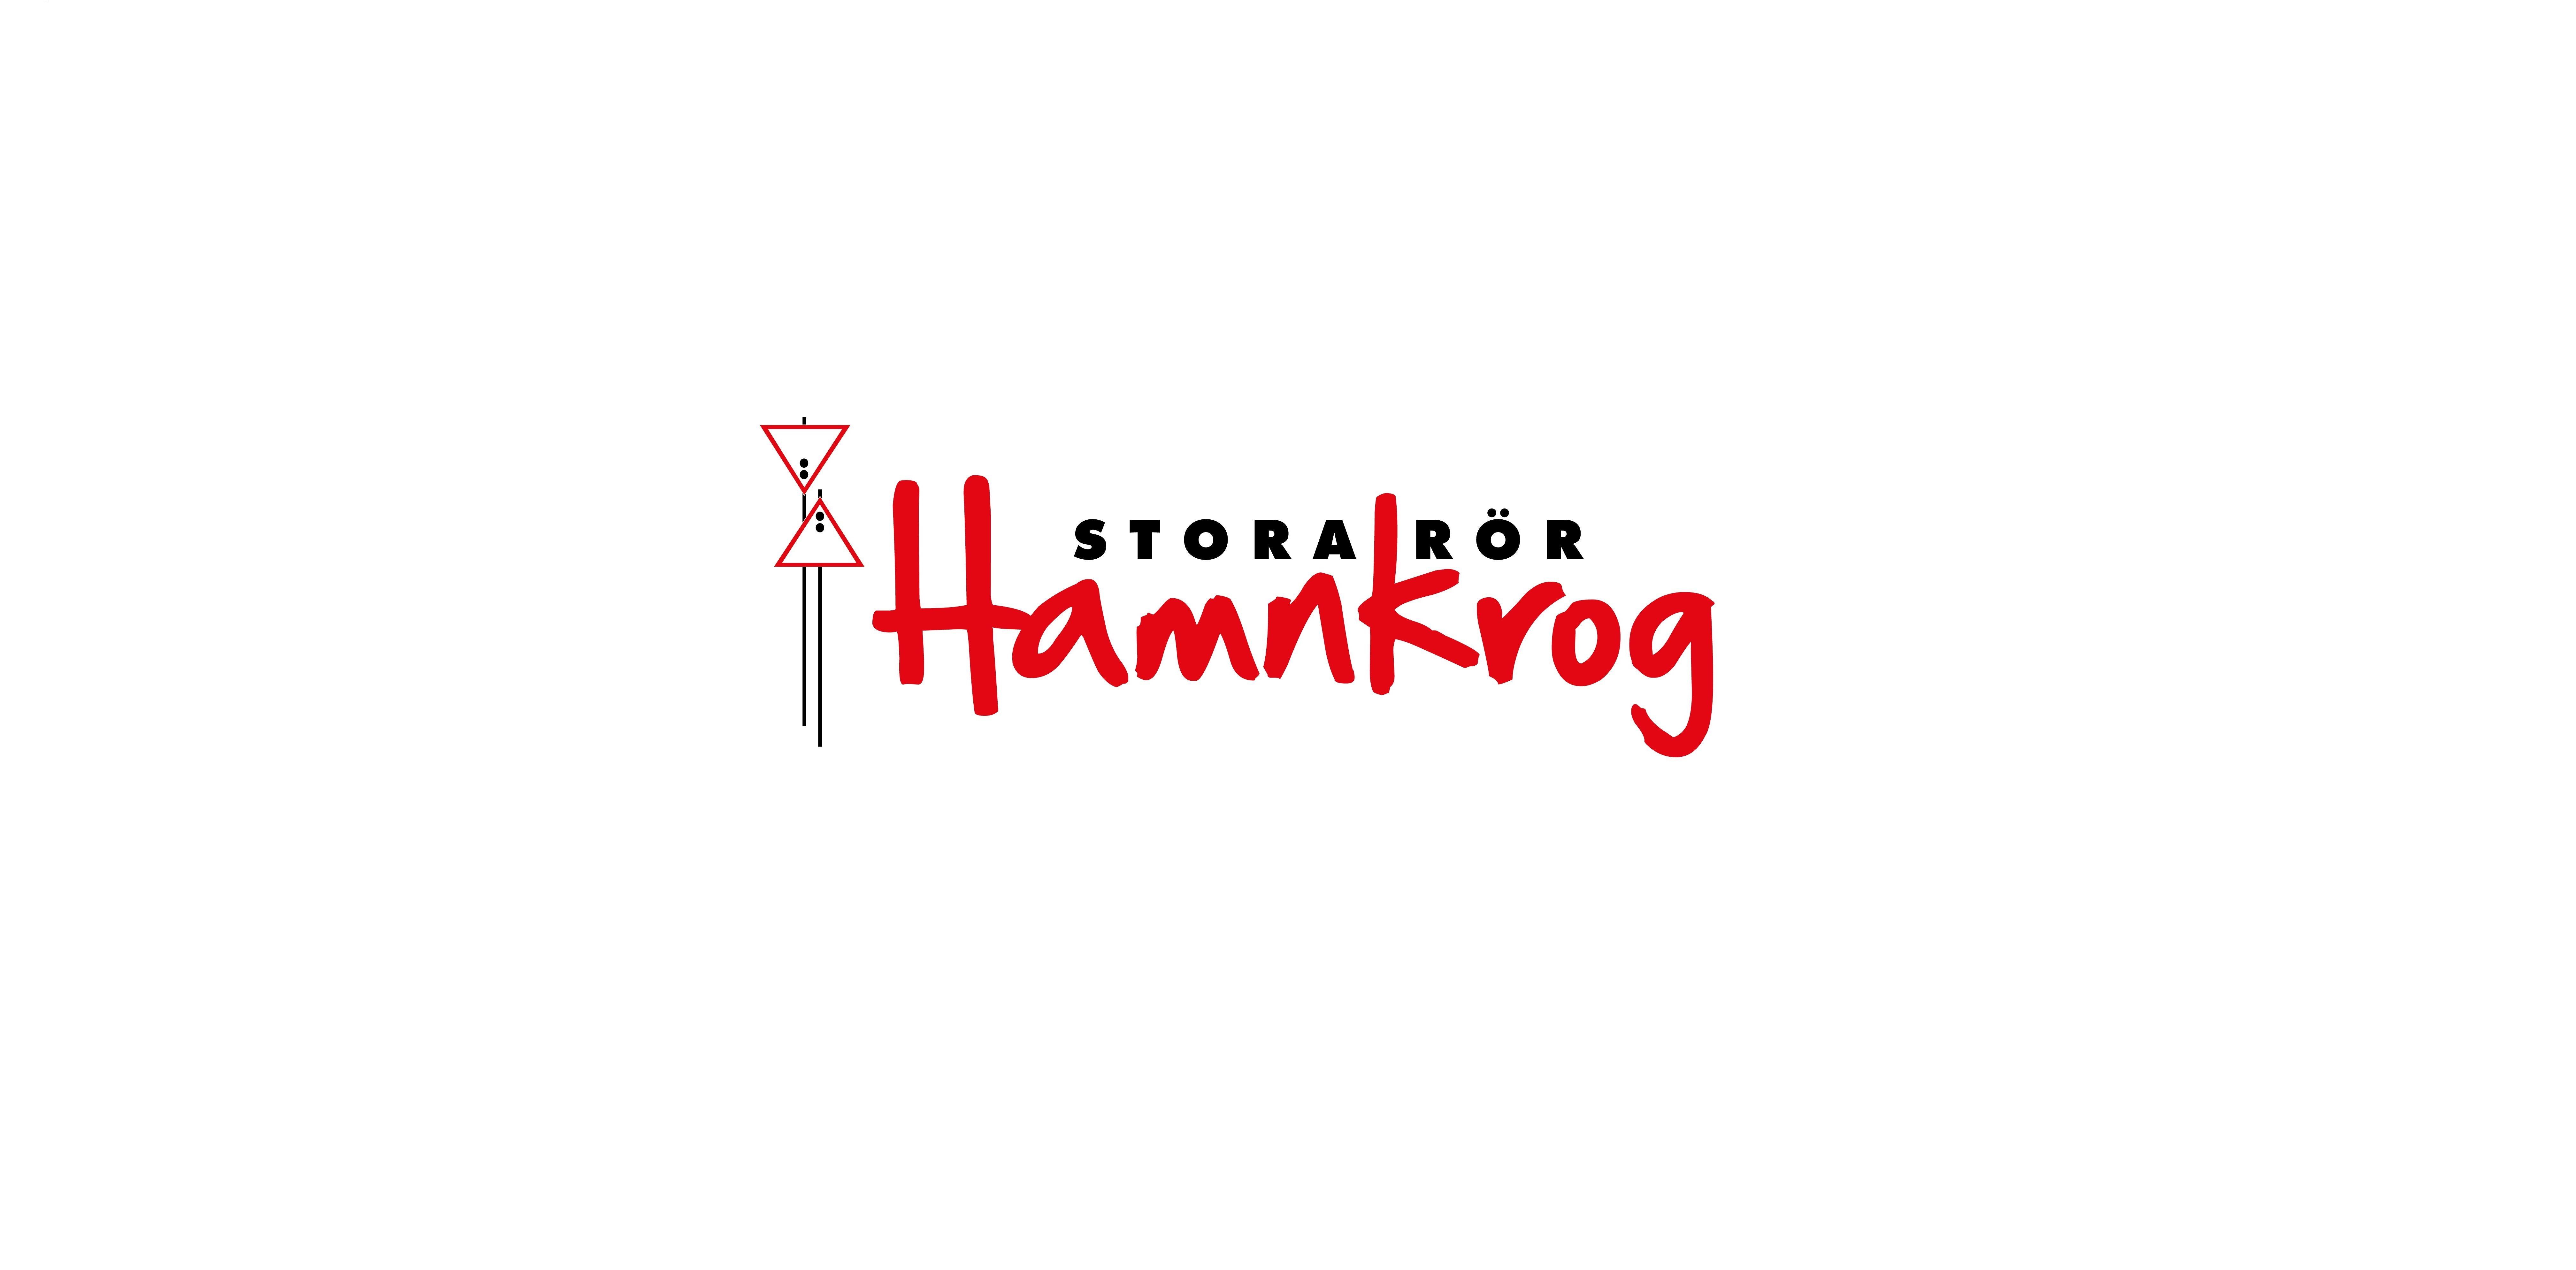 Stora Rör Hamnkafé